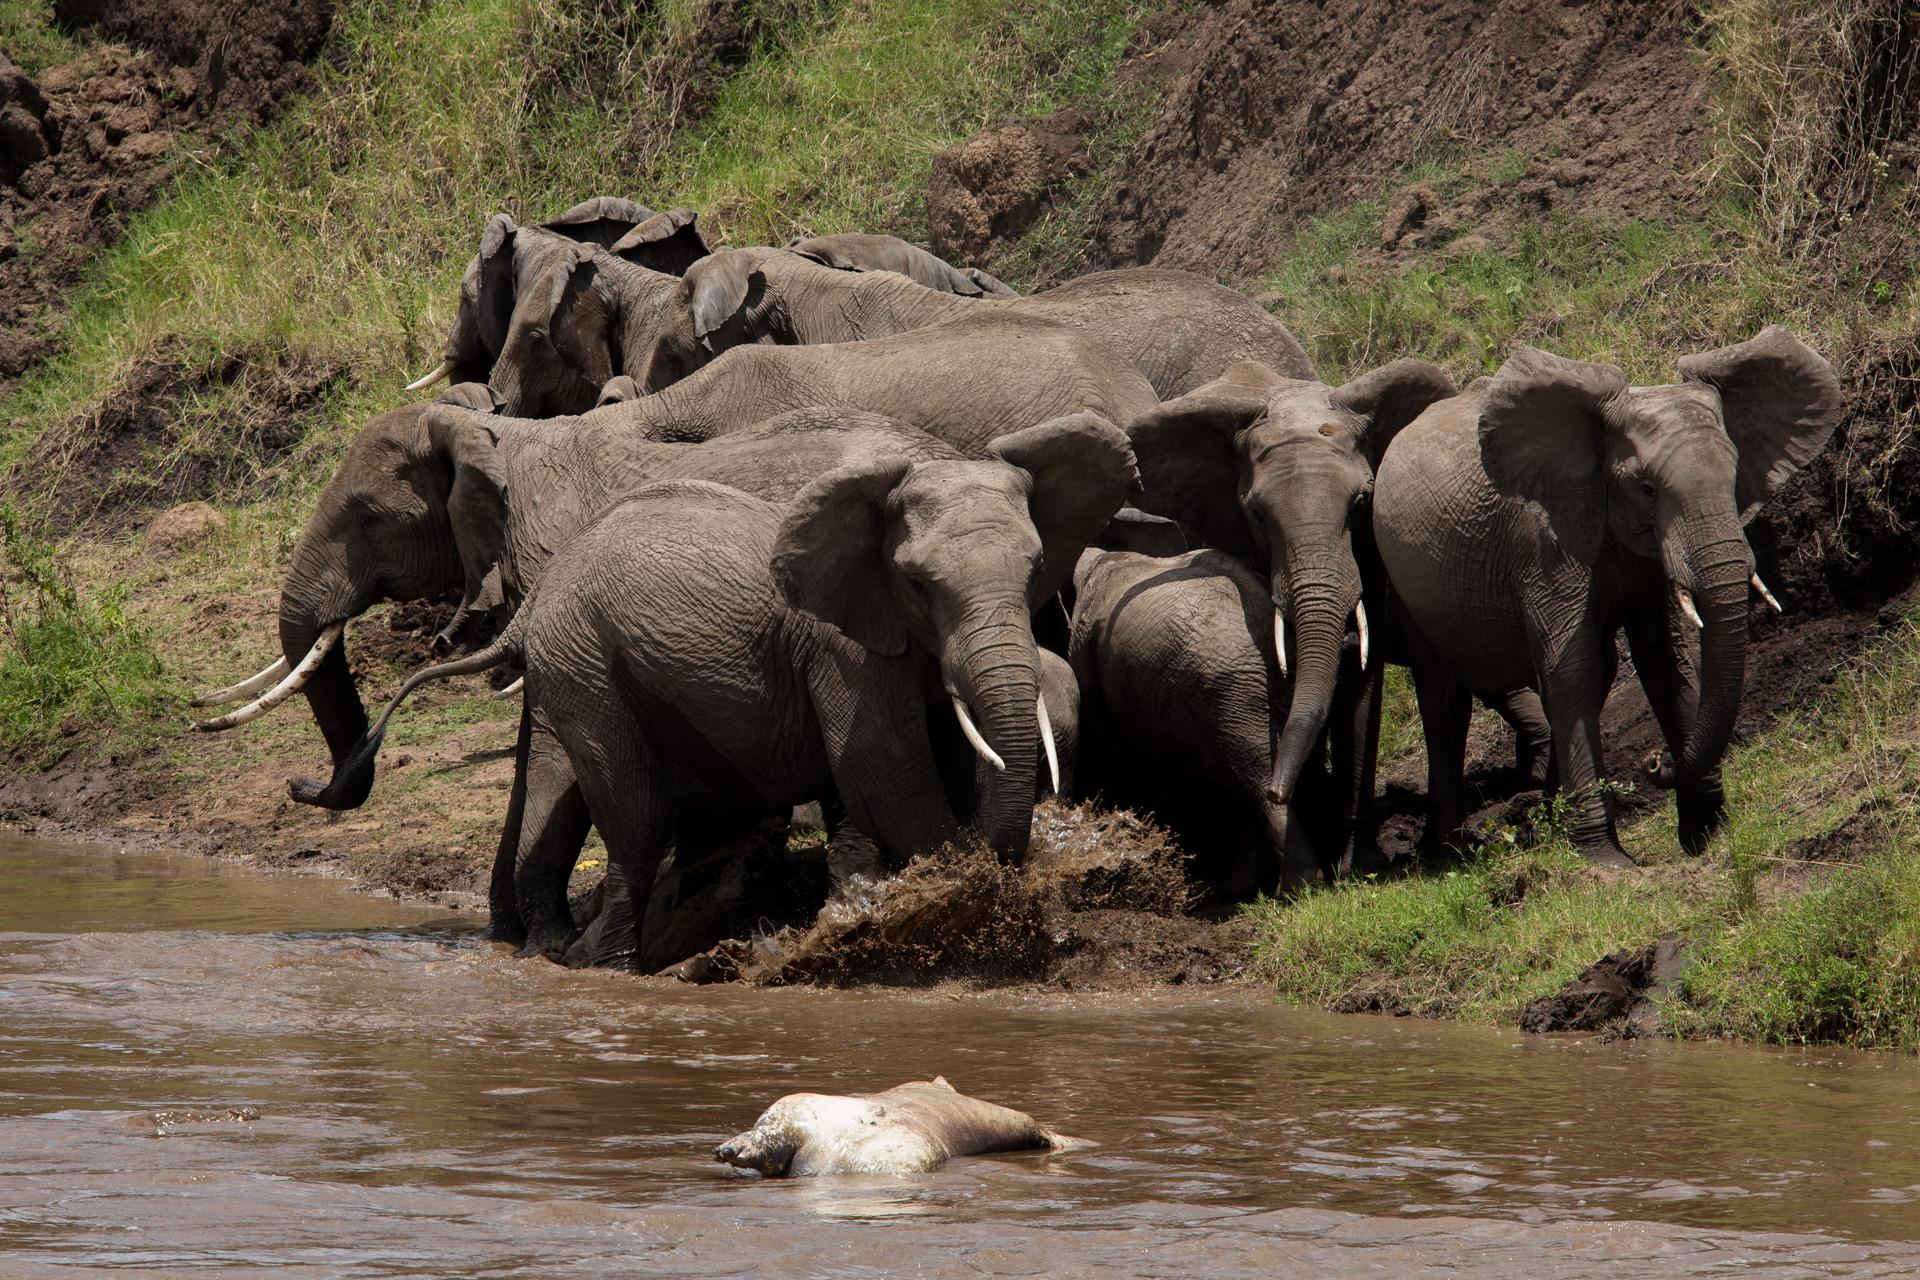 Elephants and hippo